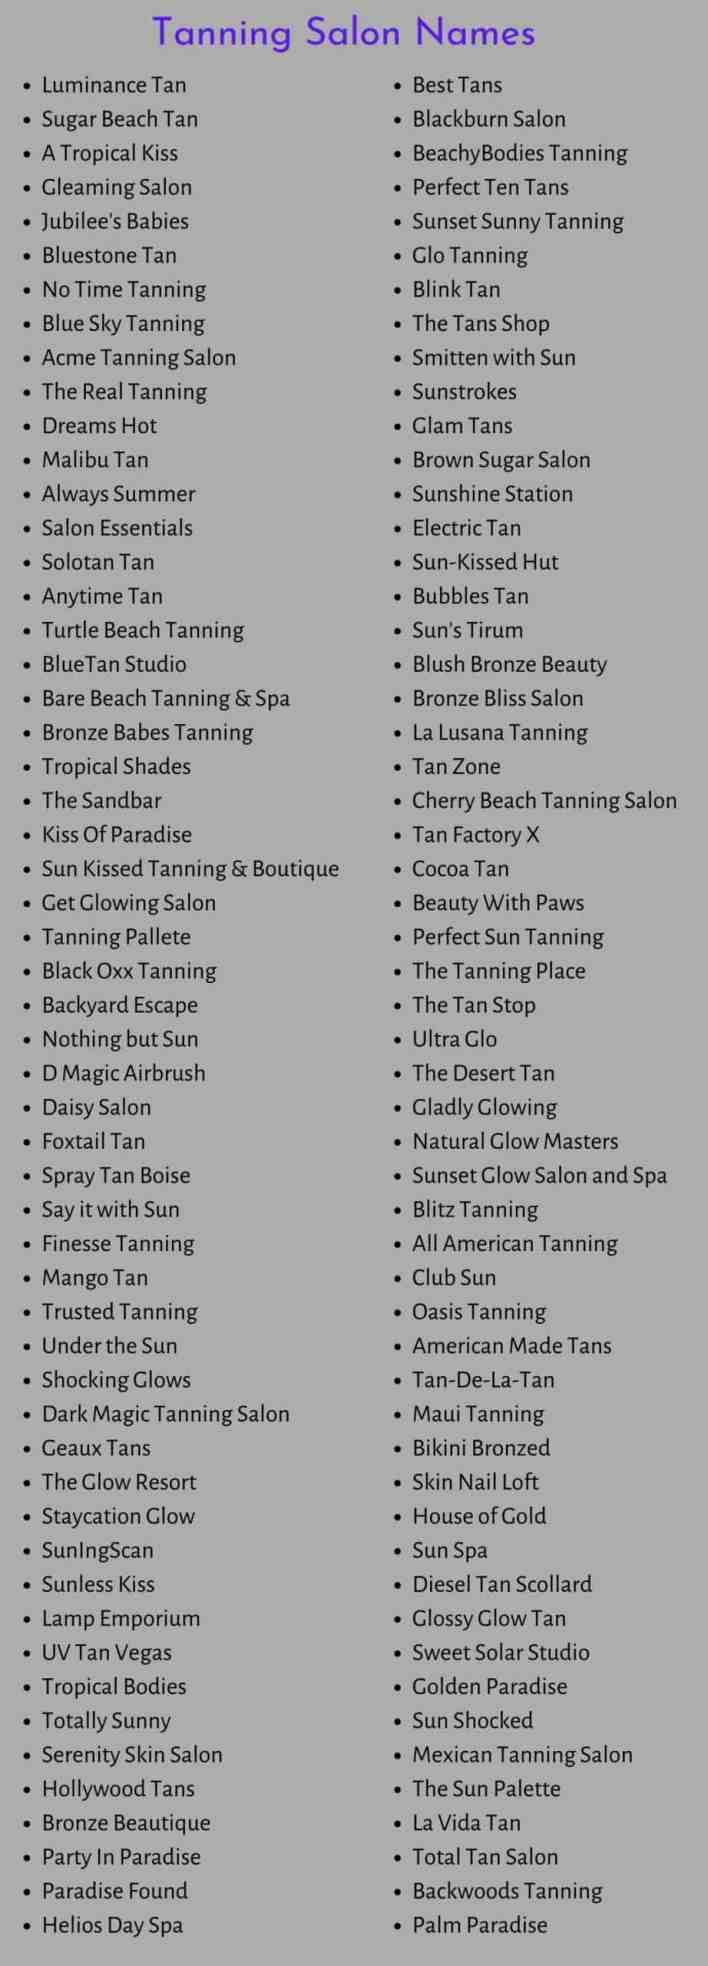 Tanning Salon Names